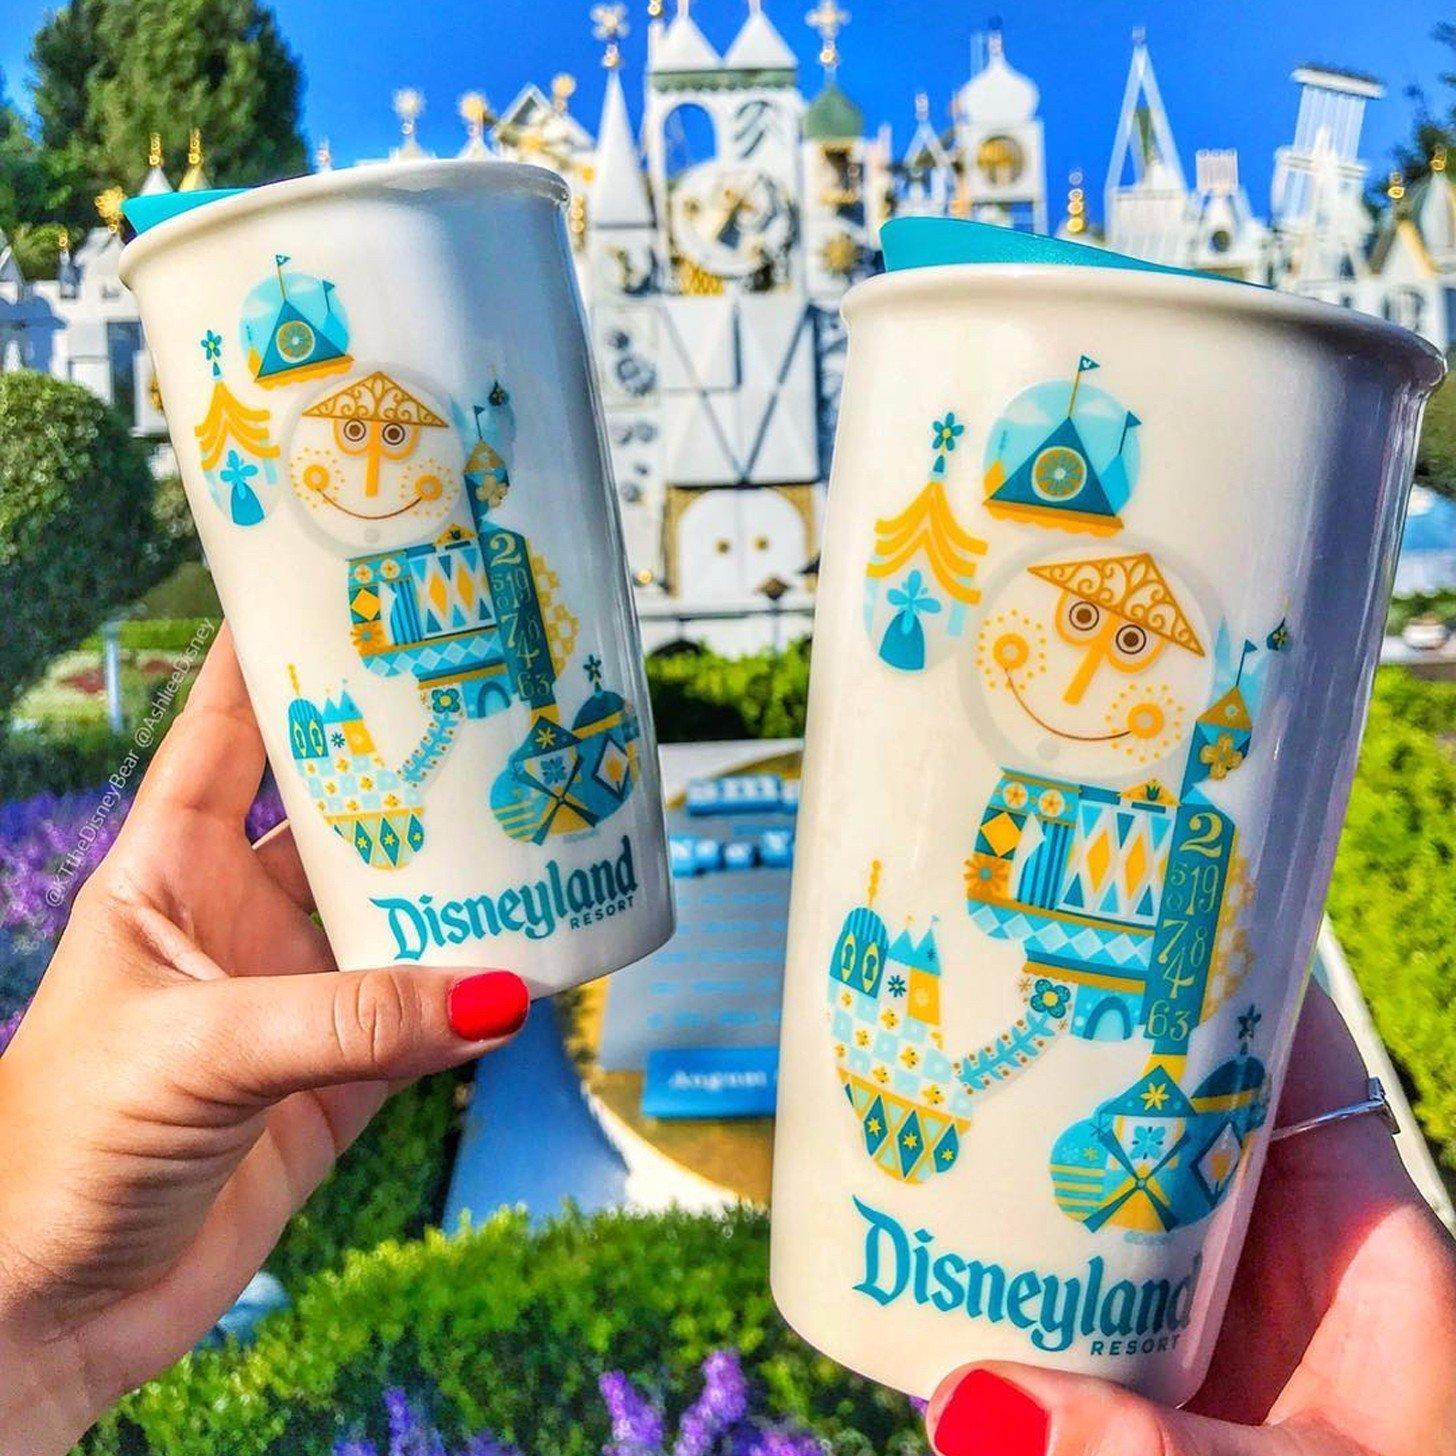 Mupeng Disney Dan Starbucks Berkolaborasi Buat Travel Mug